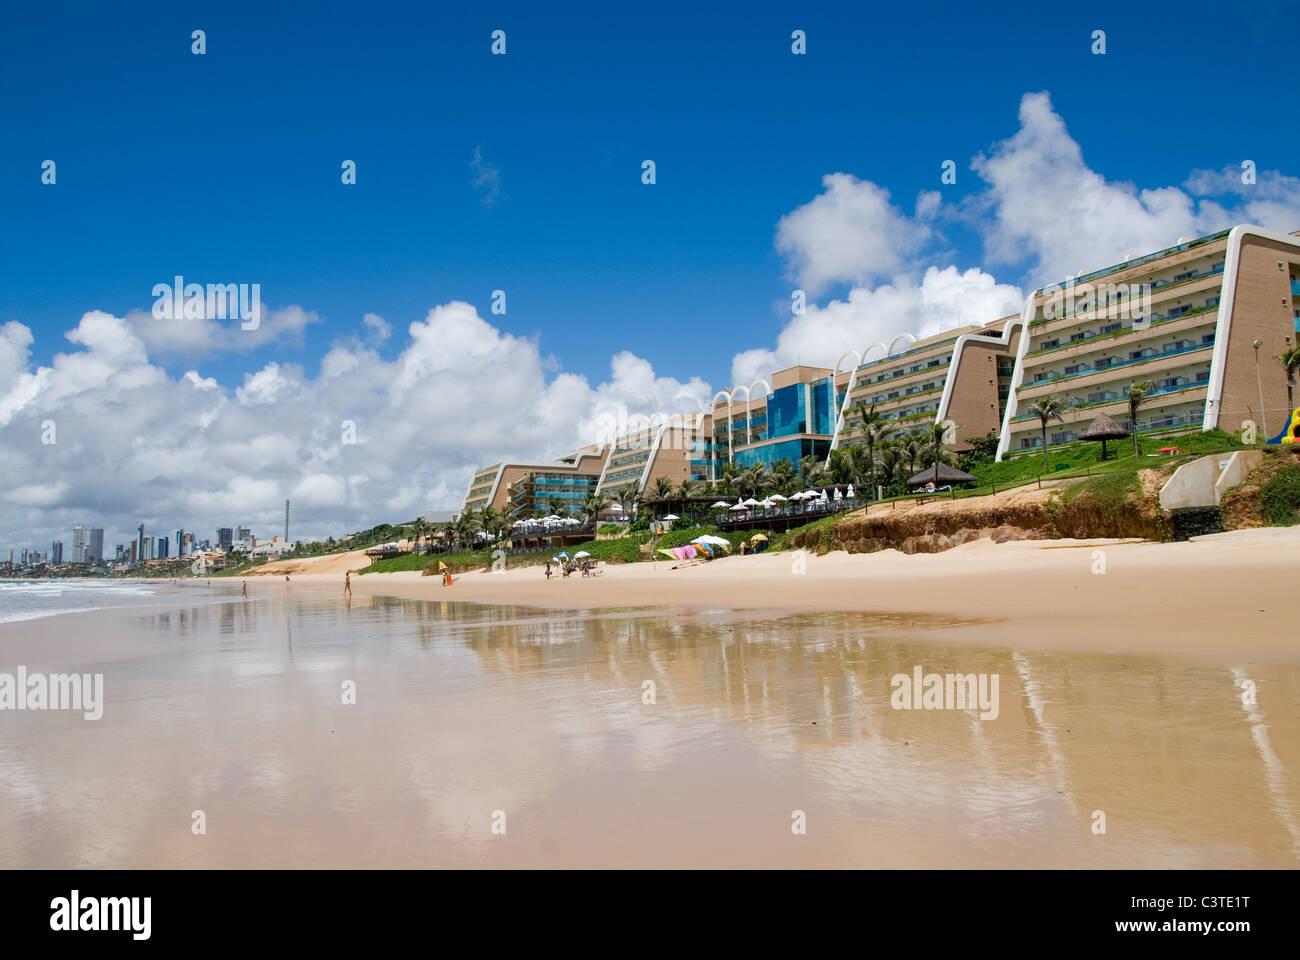 Serhs Natal Grand Hotel, Ponta Negra, Brazil. Stock Photo